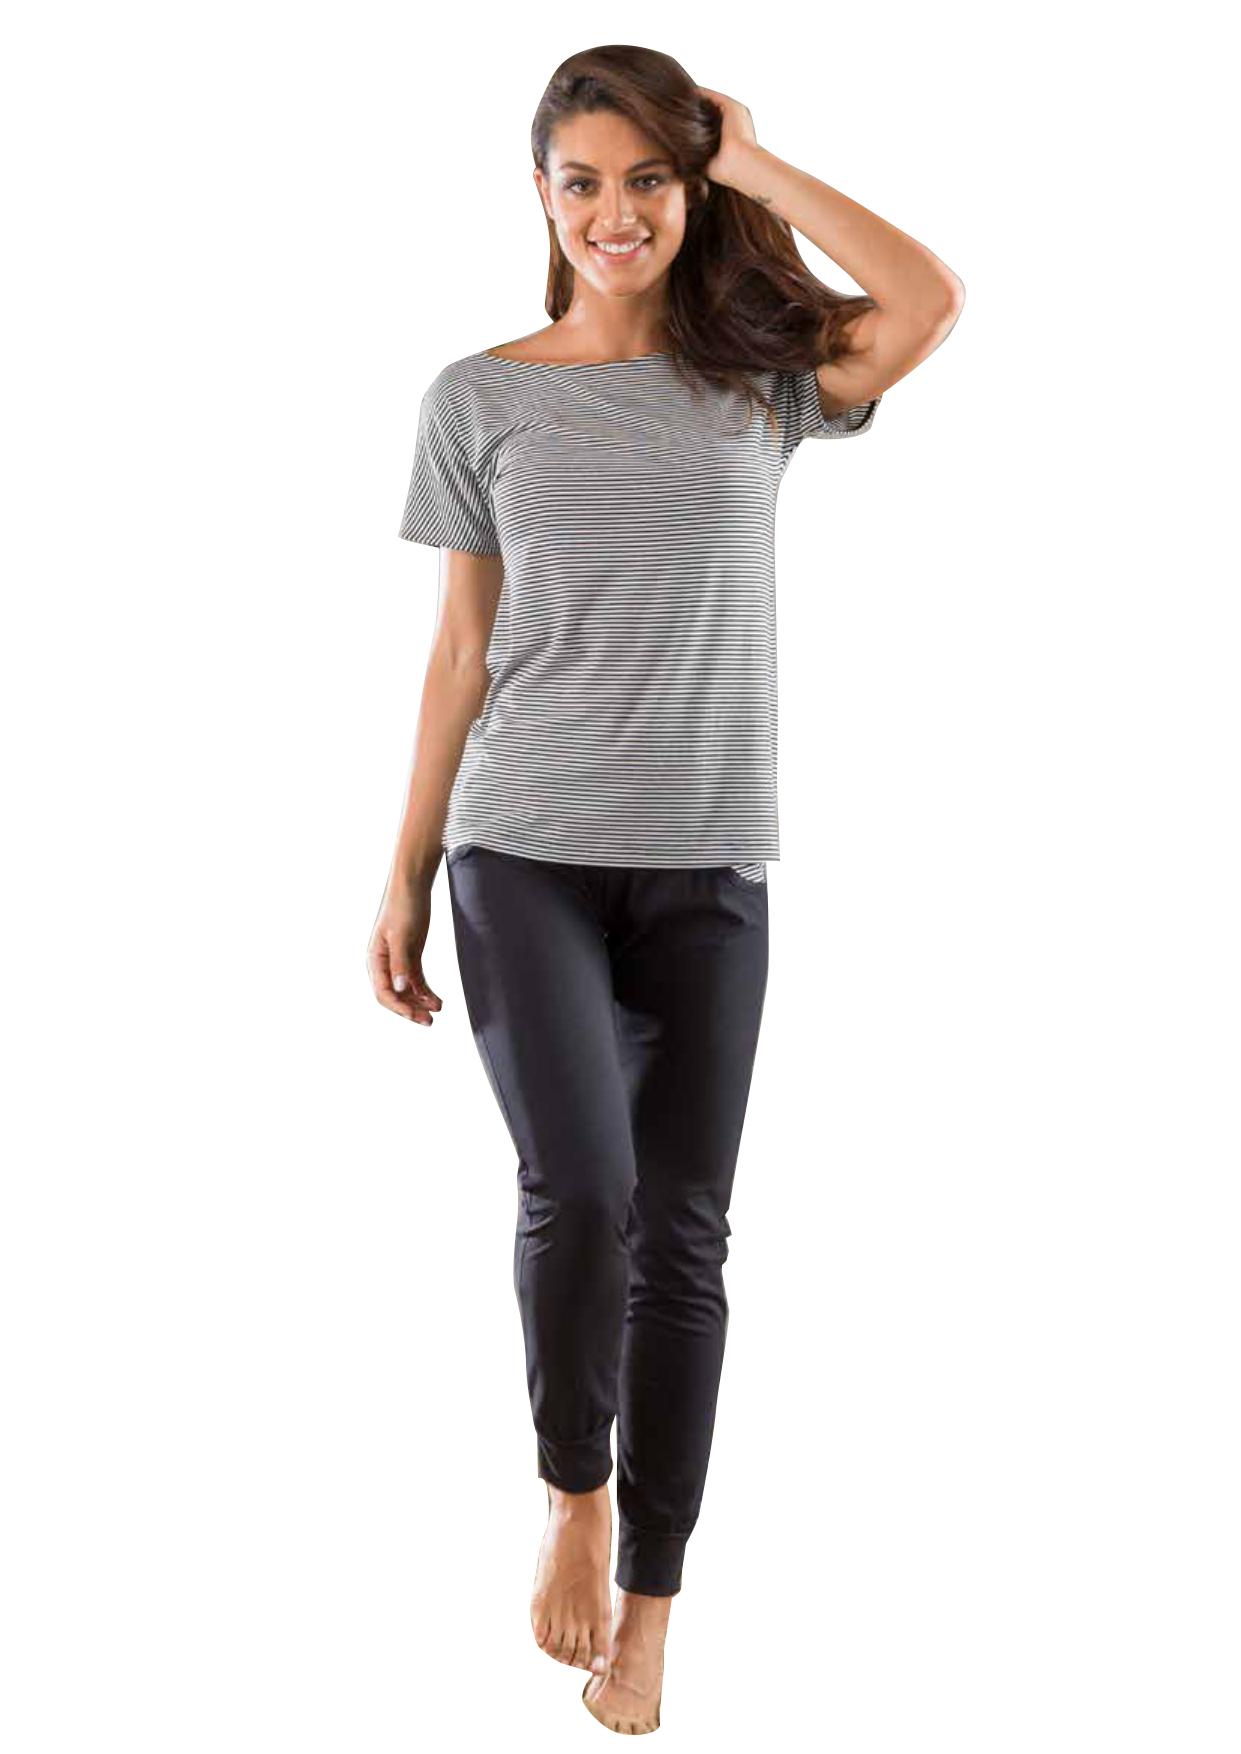 031adf9ffc3 Καλοκαιρινή γυναικεία πυτζάμα με μακρύ παντελόνι βισκόζη Ανοιξη 2019 μόνο  στο BUSTO